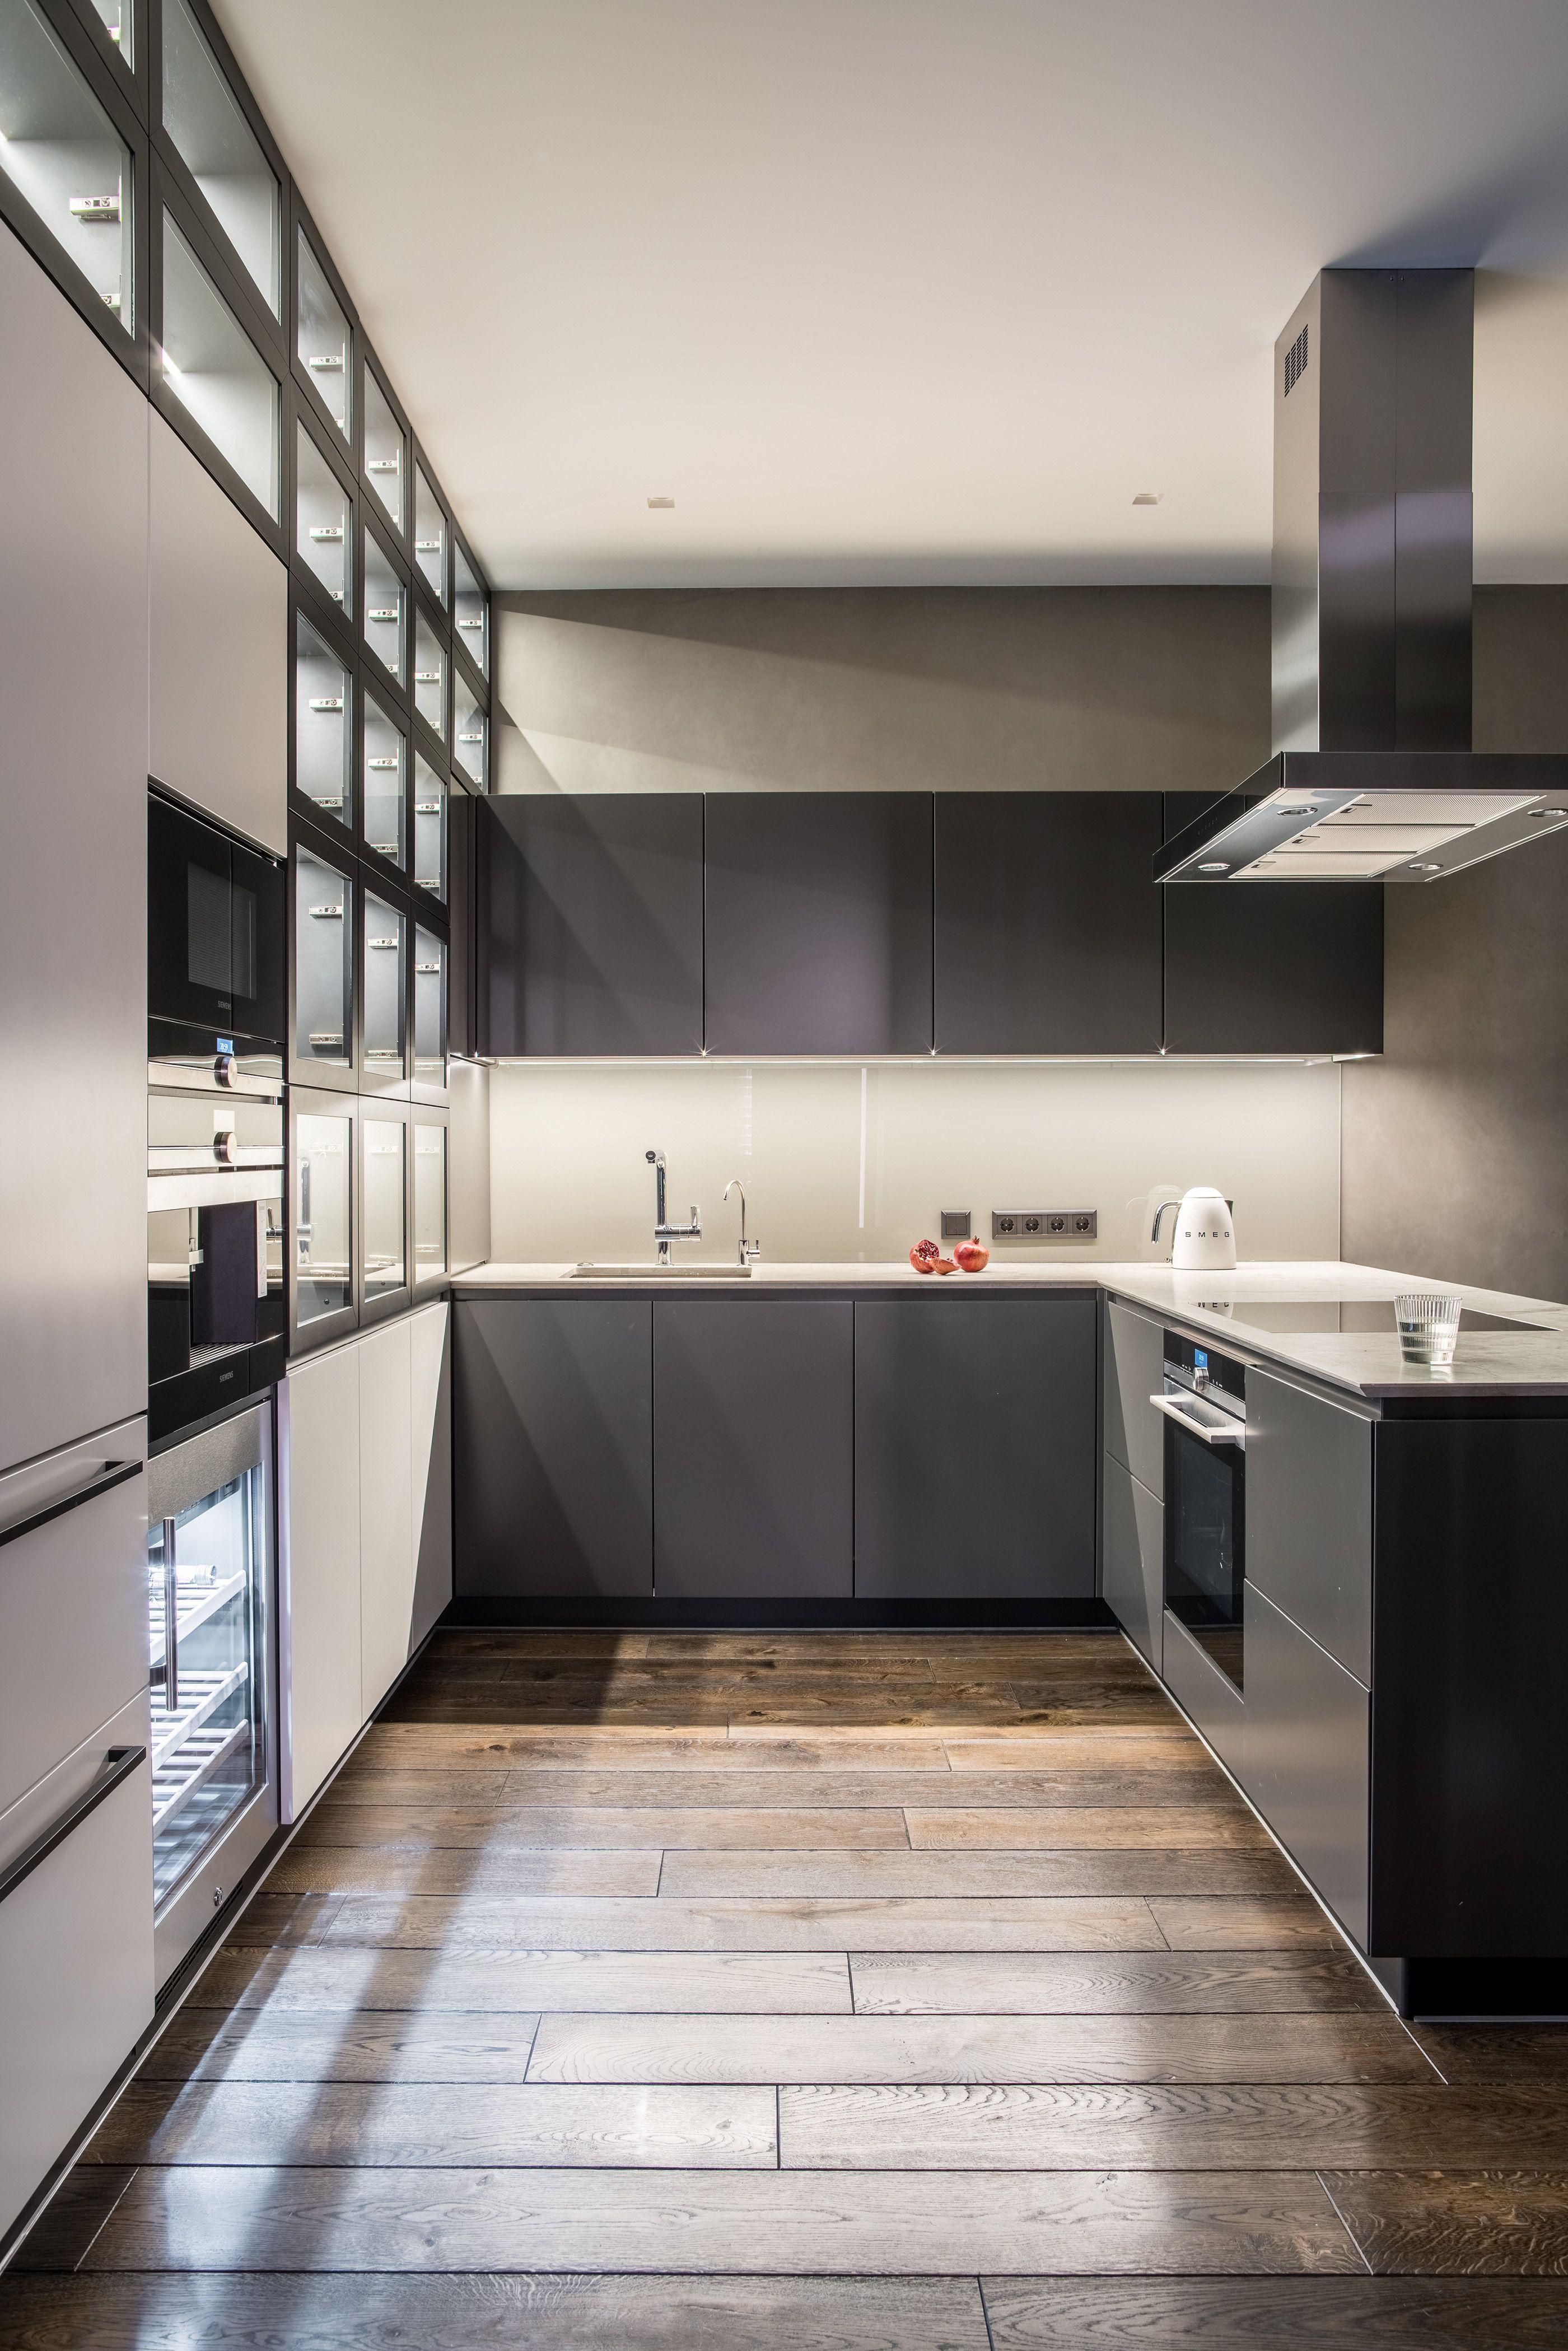 Big Apartment On Behance Kitchen Remodel Design Kitchen Design Pictures Apartment Kitchen